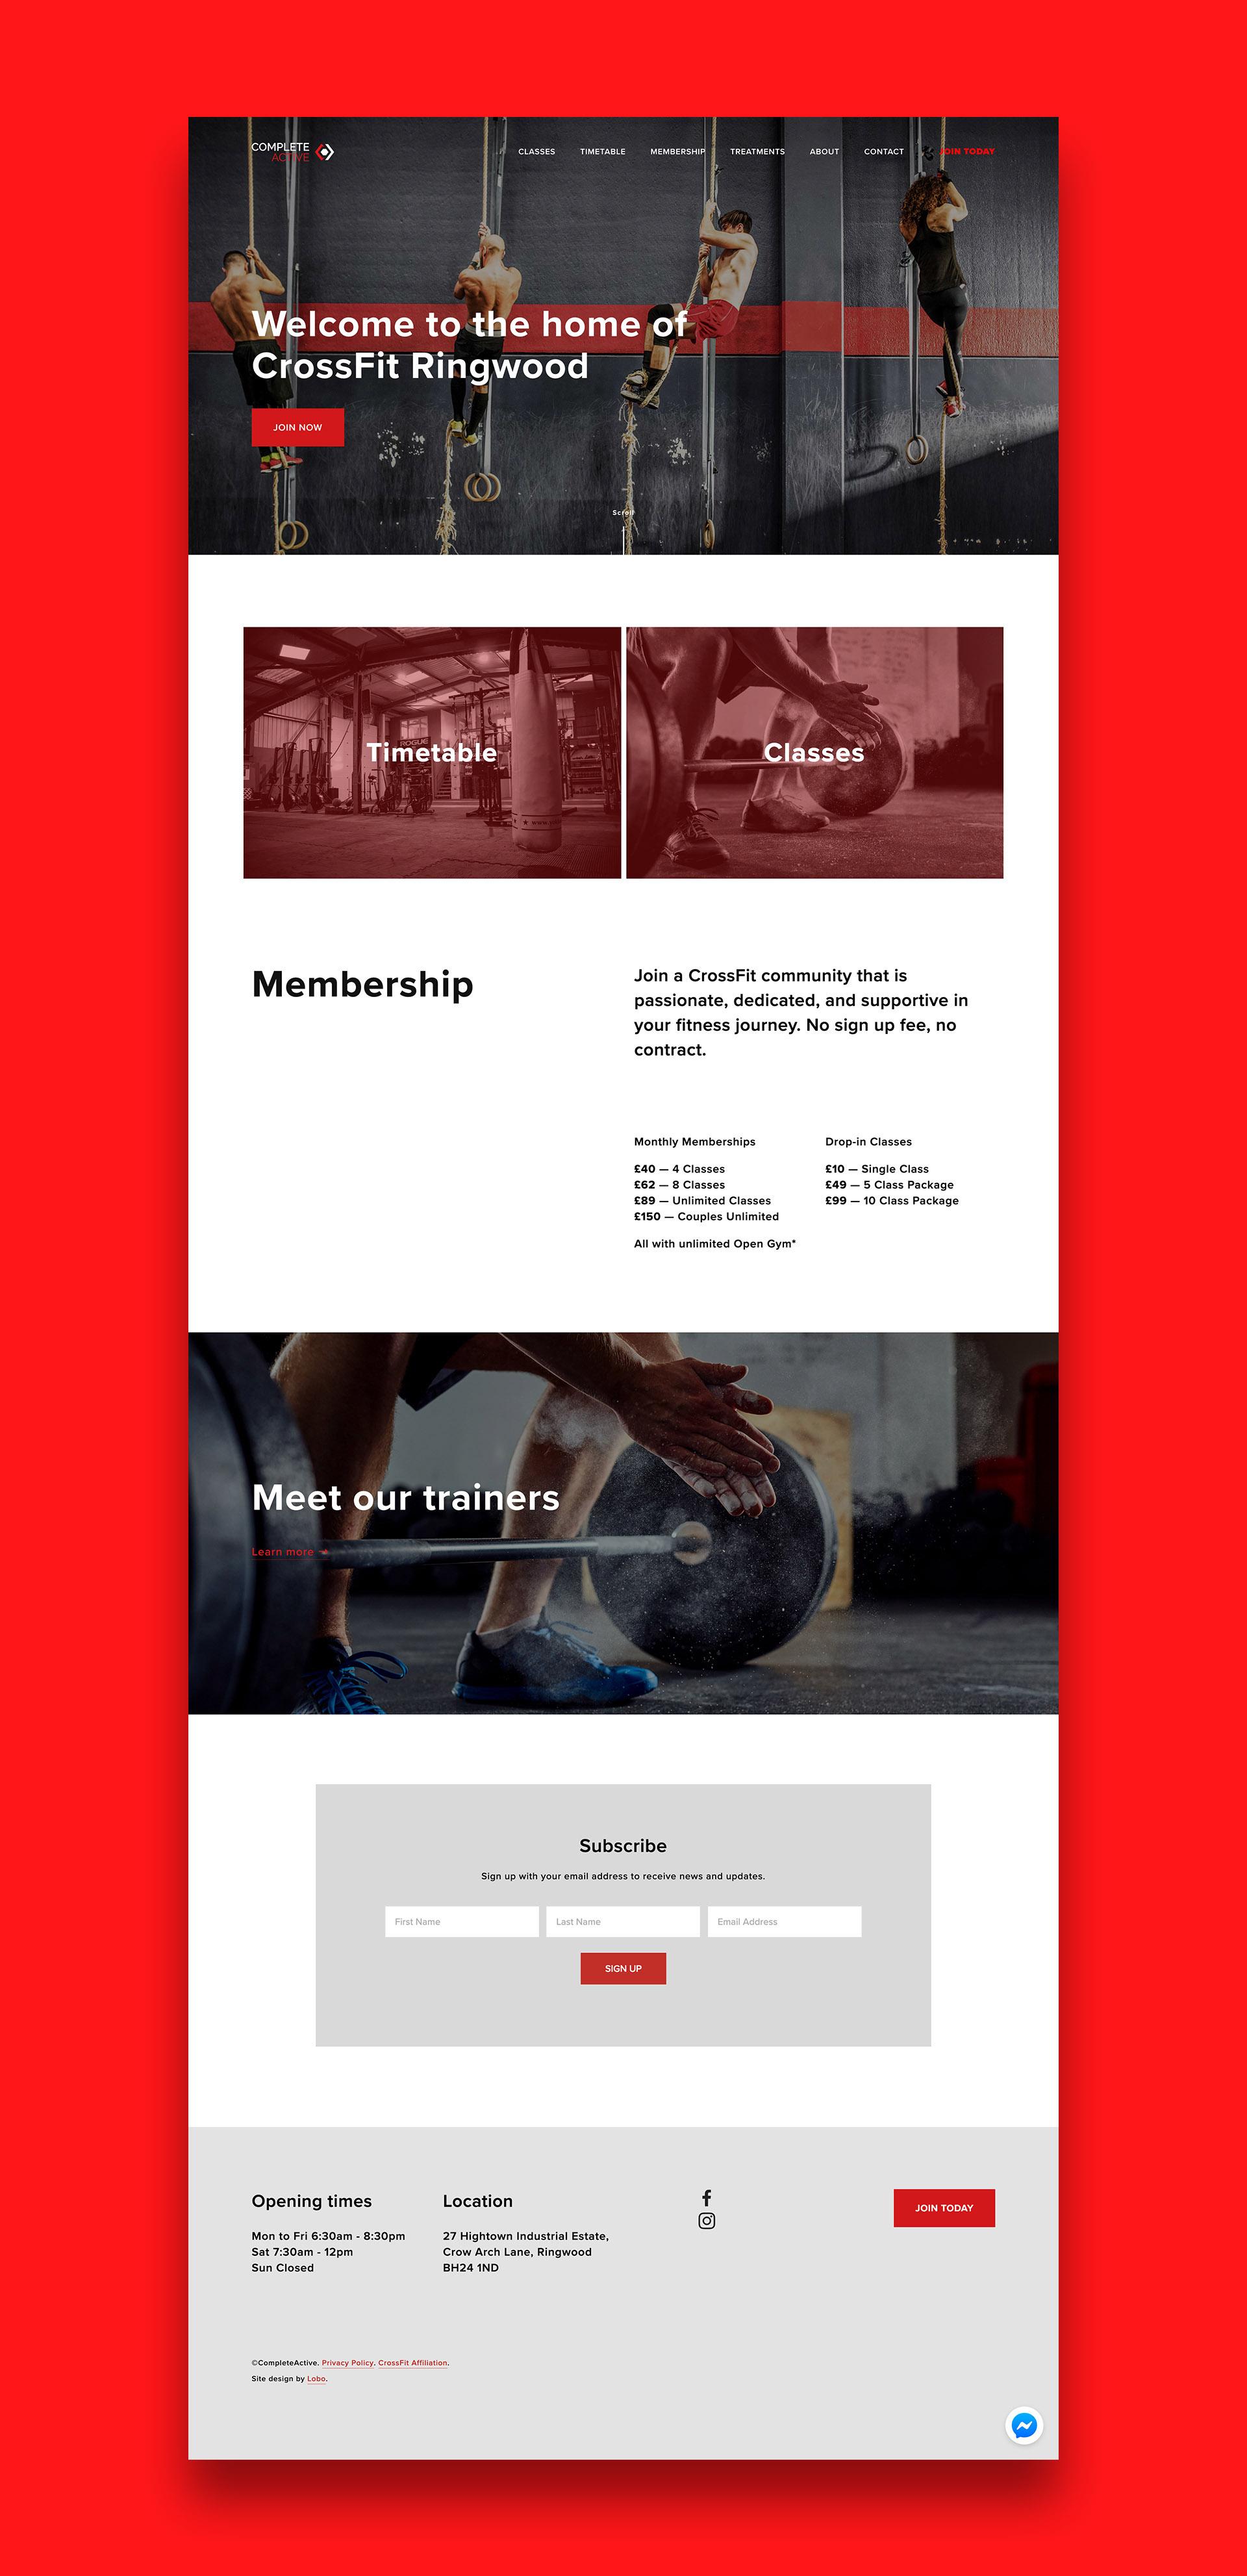 06-Lobo-Creative-Complete-Active-digital-website-design-development-in-Bournemouth.jpg